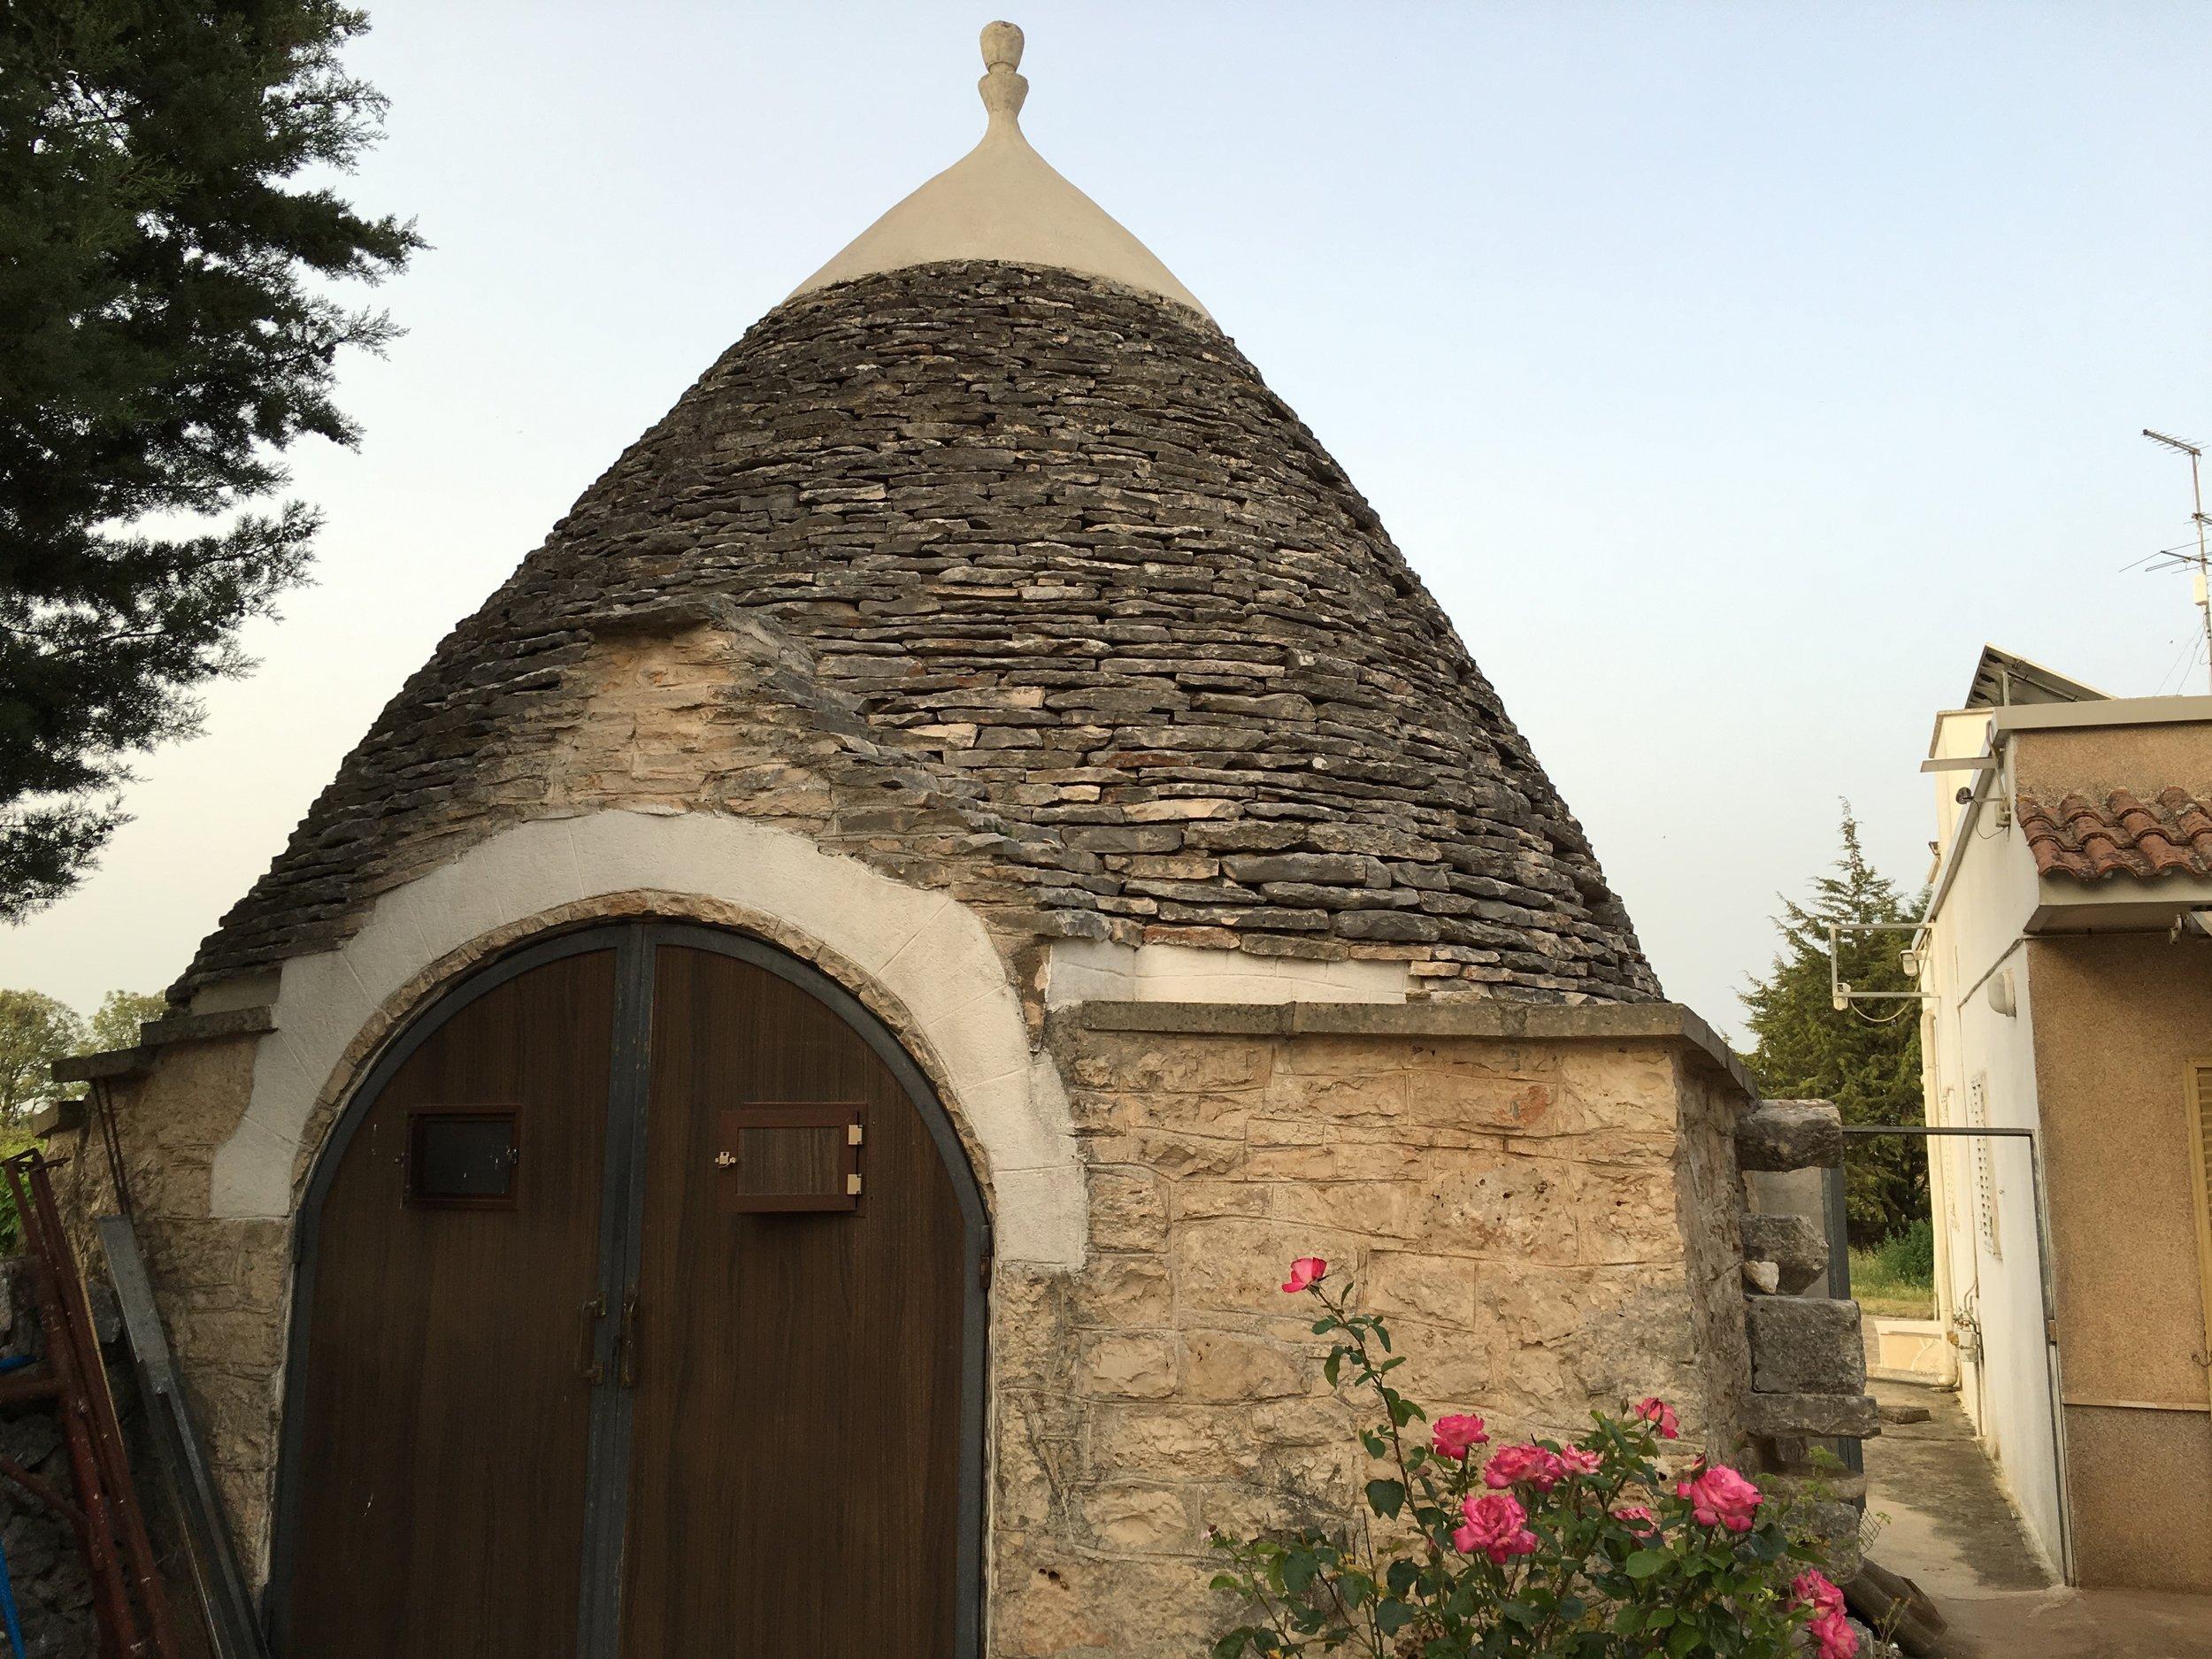 Old cellar entrance